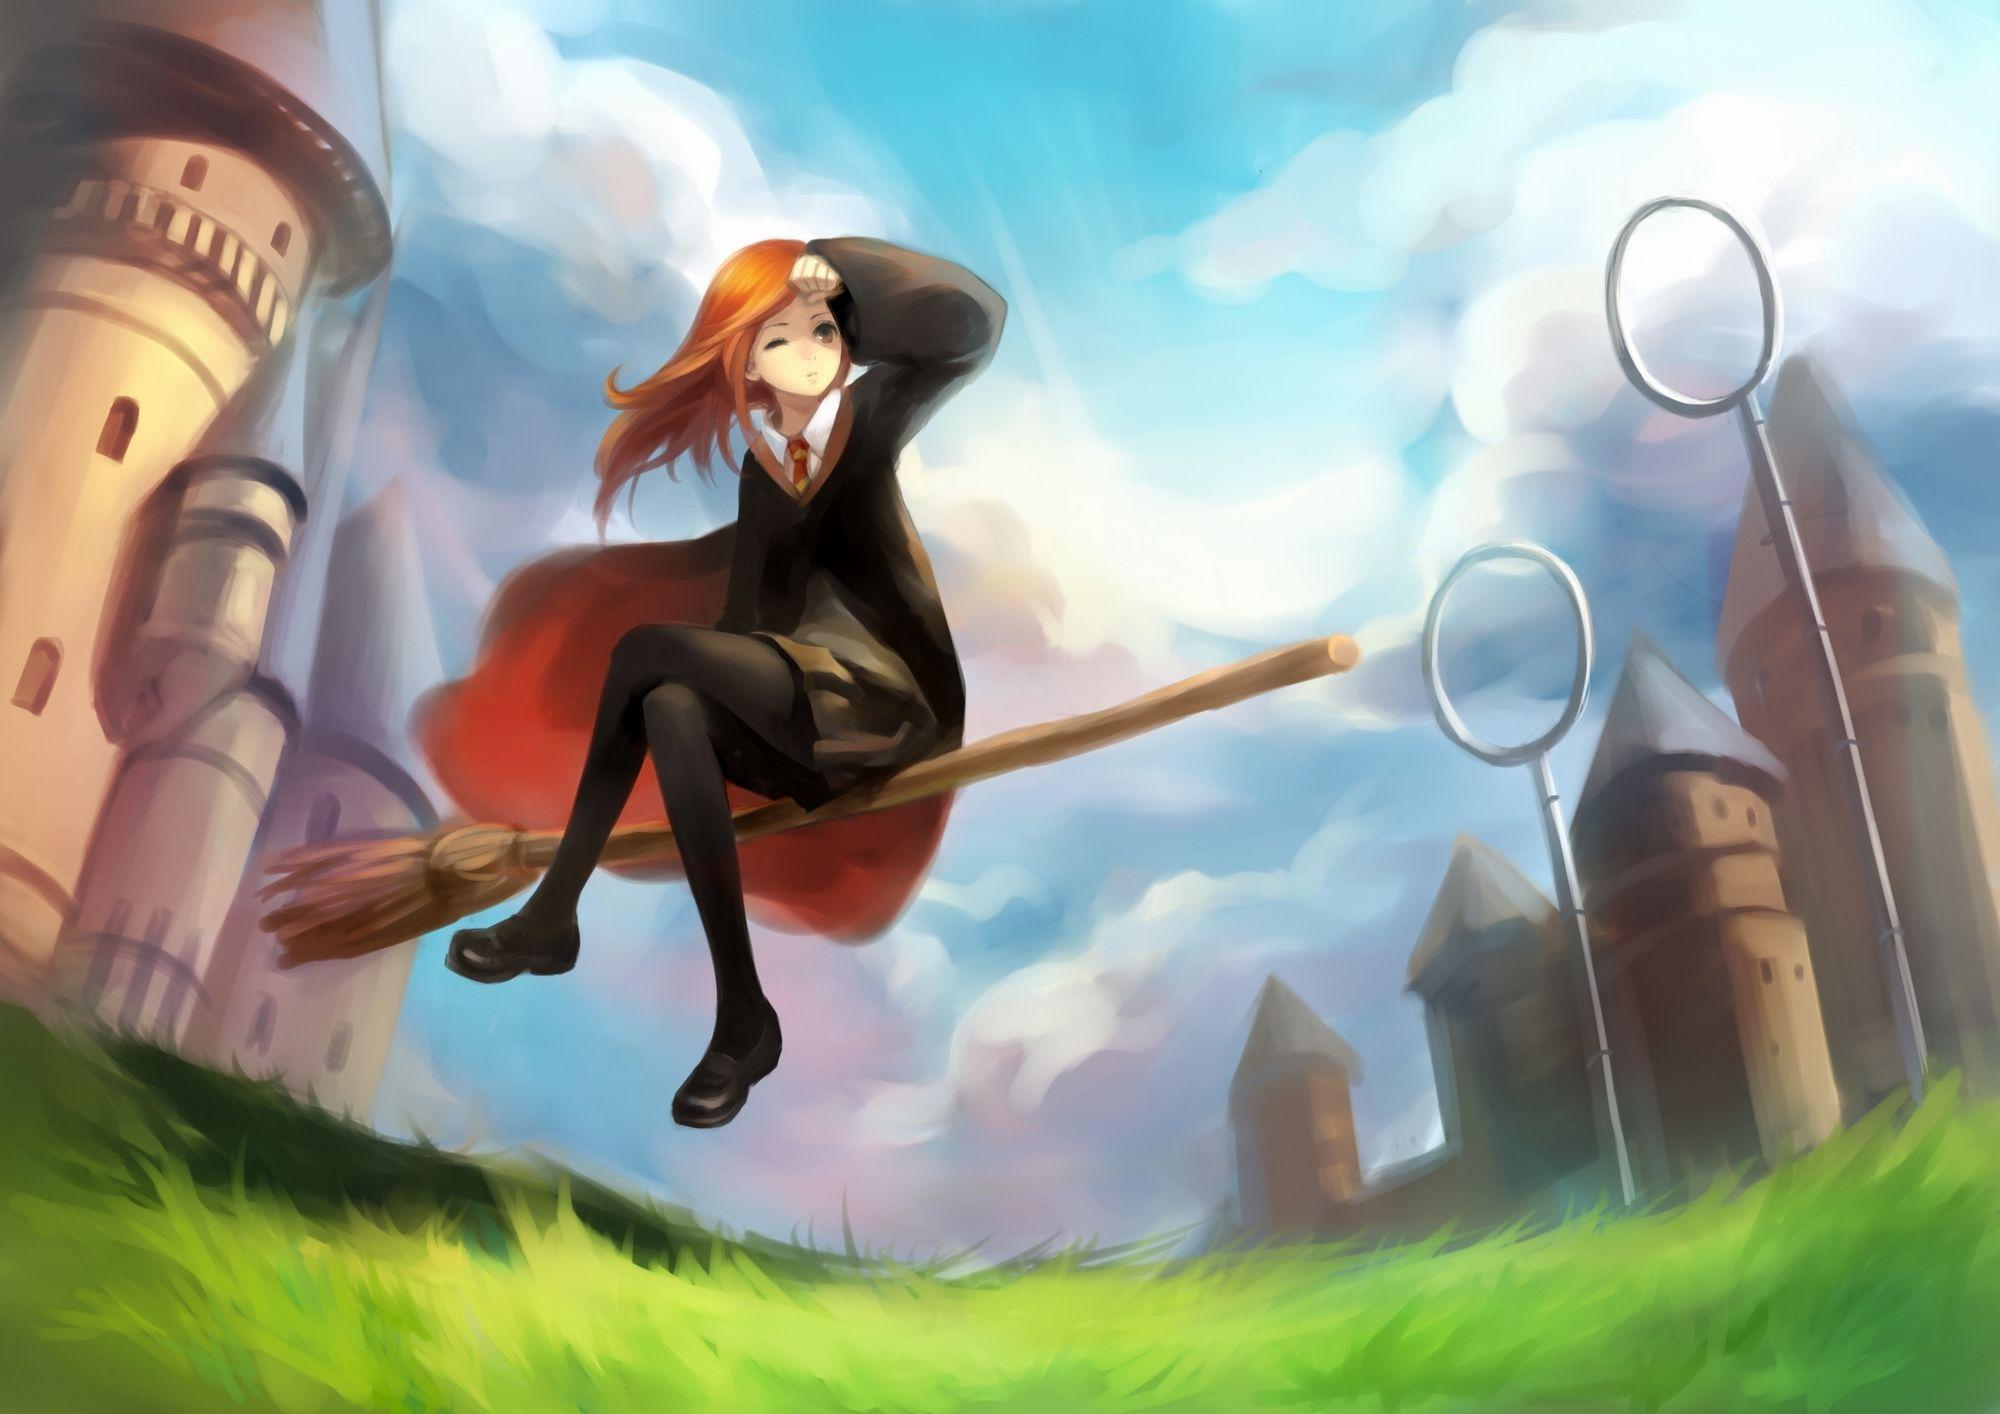 Cool Wallpaper Harry Potter Fanart - 6056efd4d4a9e8aa08b8314343af746b  Picture_173566.jpg